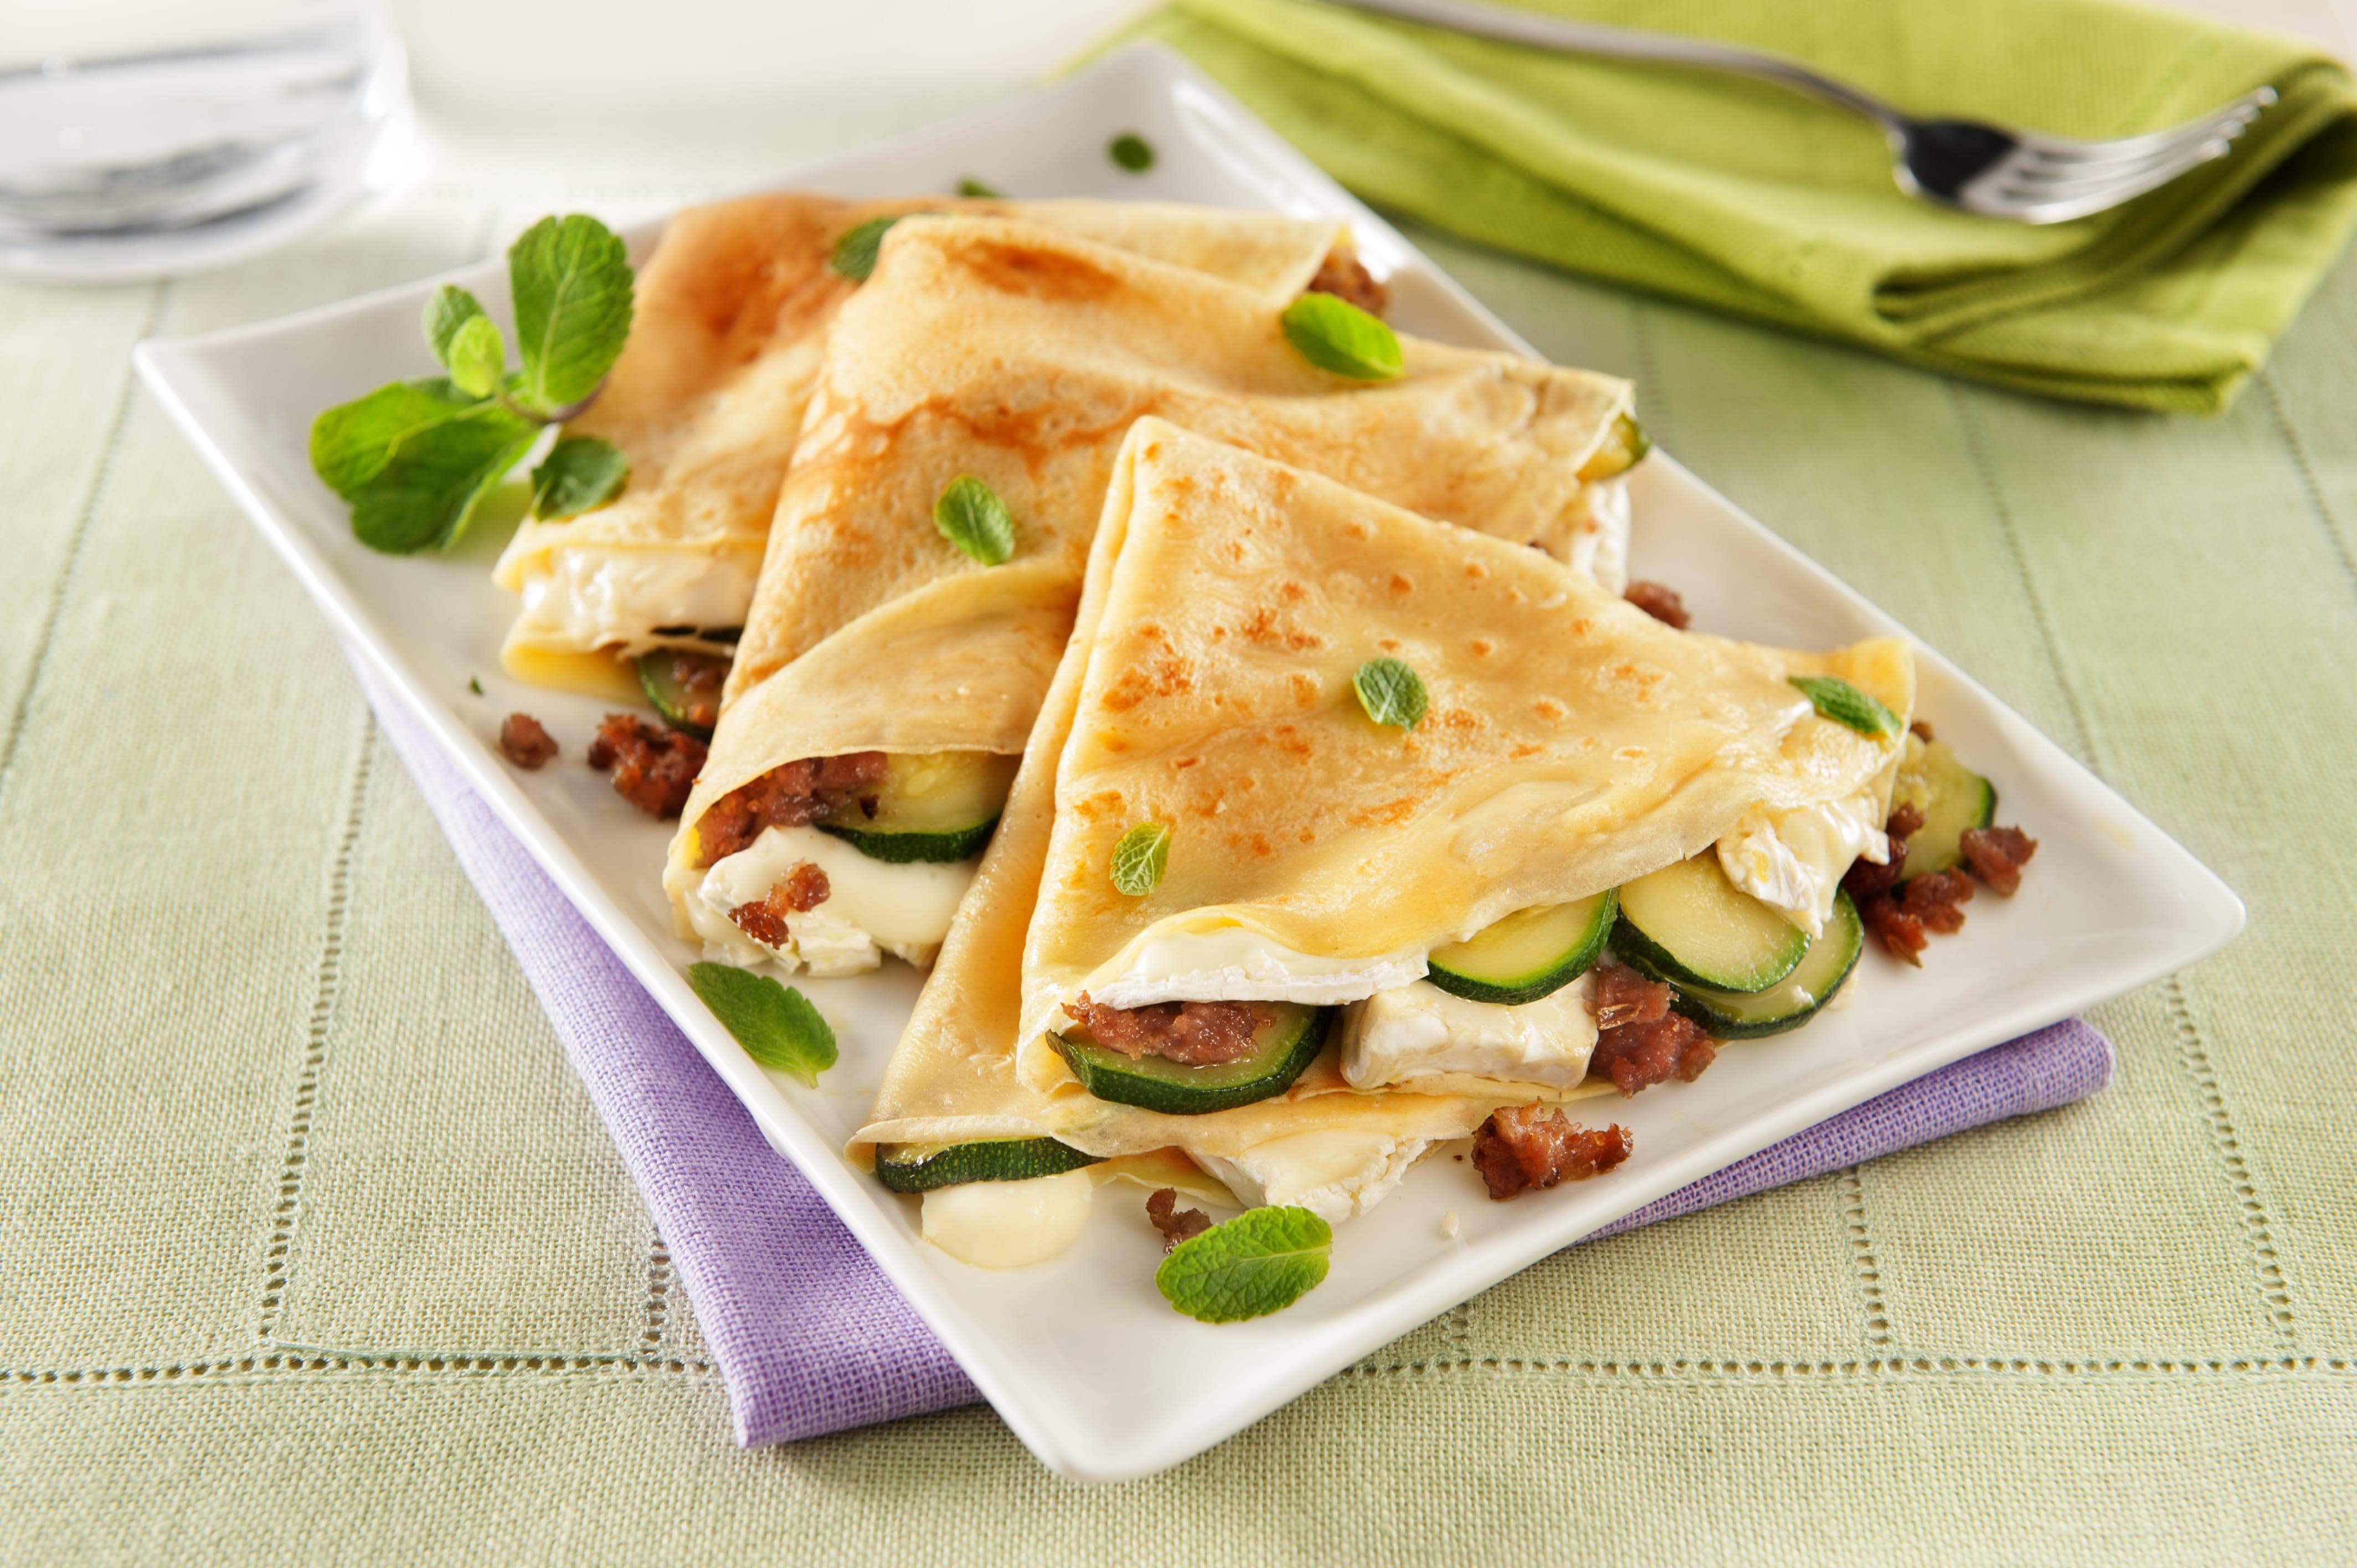 Crêpes con camembert, zucchine trifolate e salsiccia sgranata